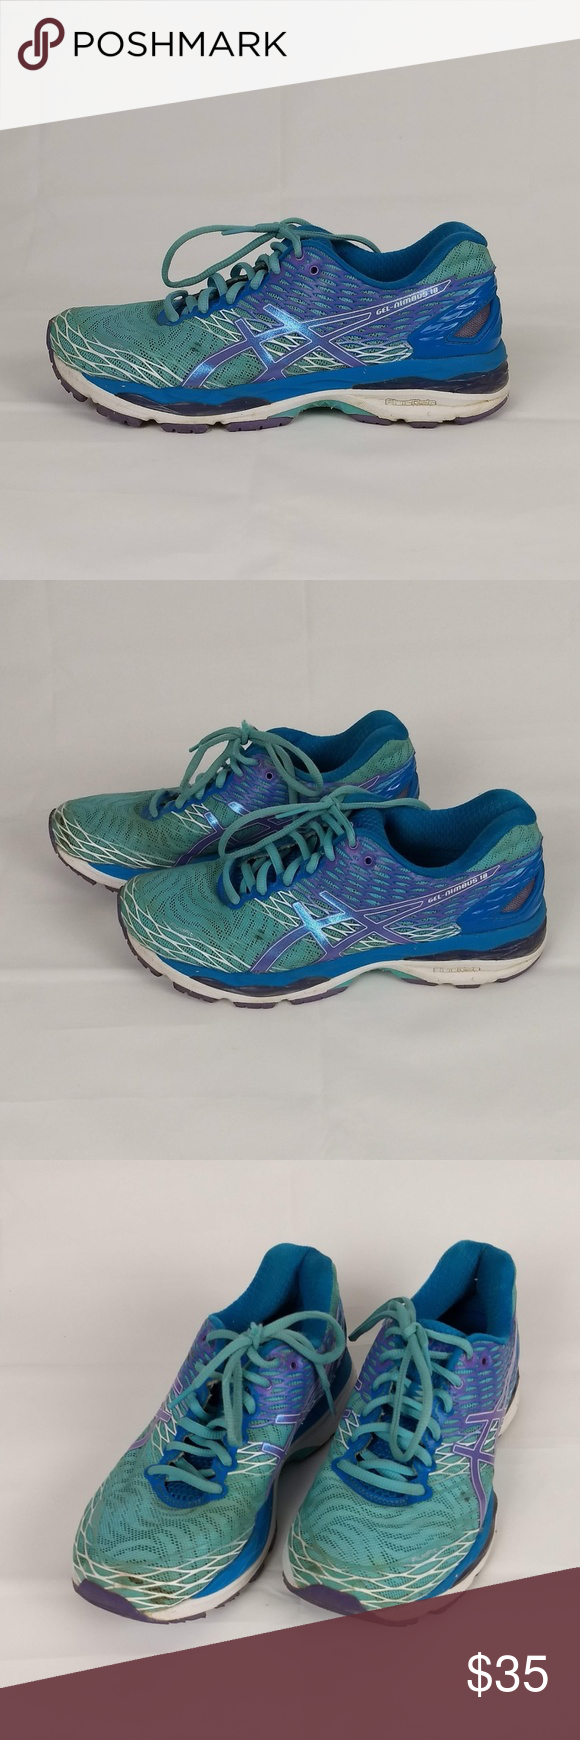 c7b0cec92a7 Asics Gel Nimbus 18 D Running Shoes Womens Size 8 Asics Gel Nimbus ...